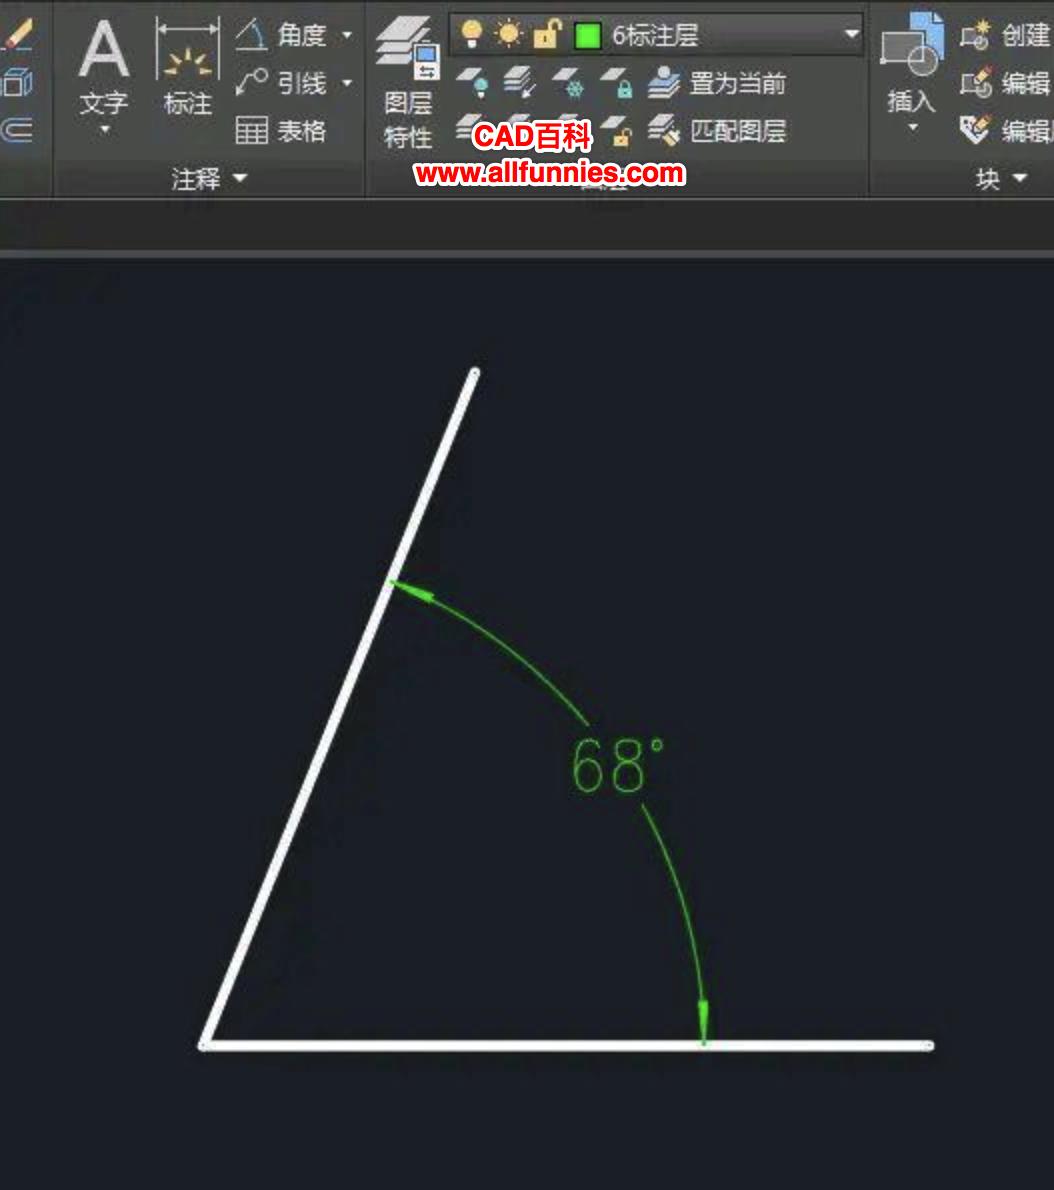 CAD等分角度怎么用,快捷键是什么